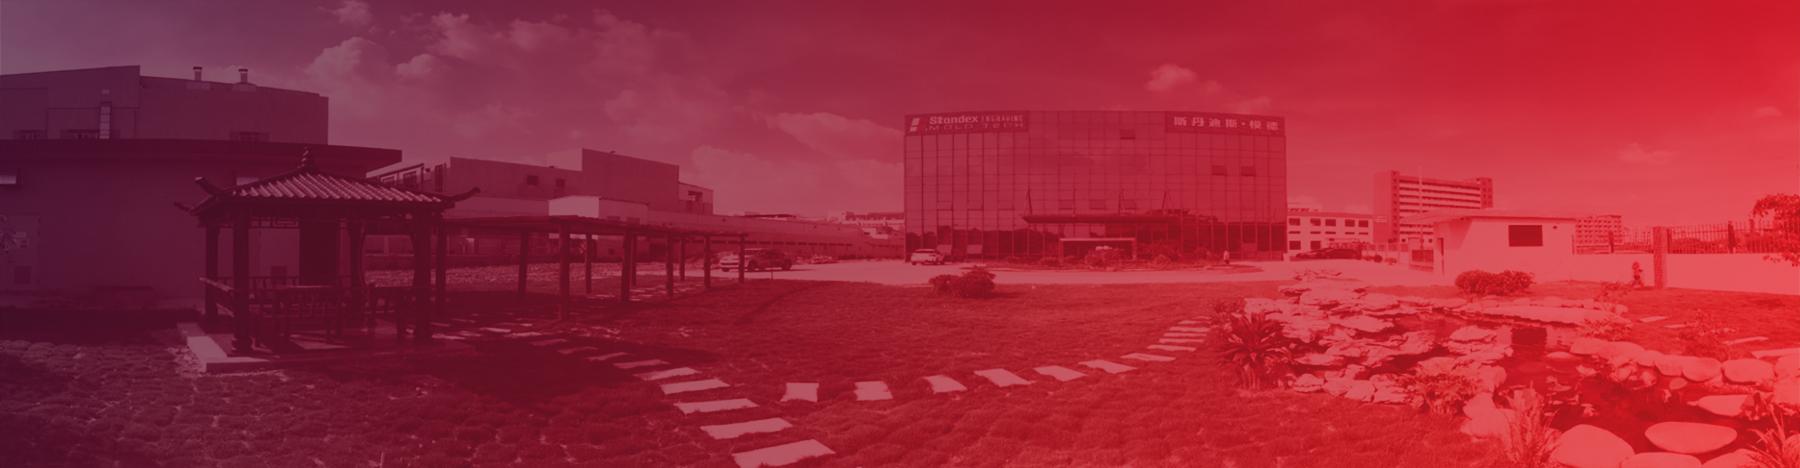 Spacious Mold-Tech Dongguan doubles production capability